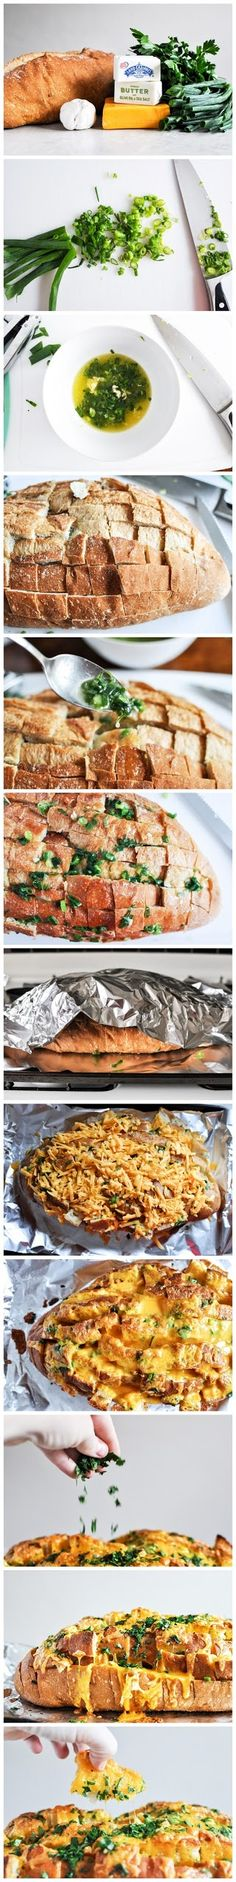 joysama images: Cheddar Tailgating Bread